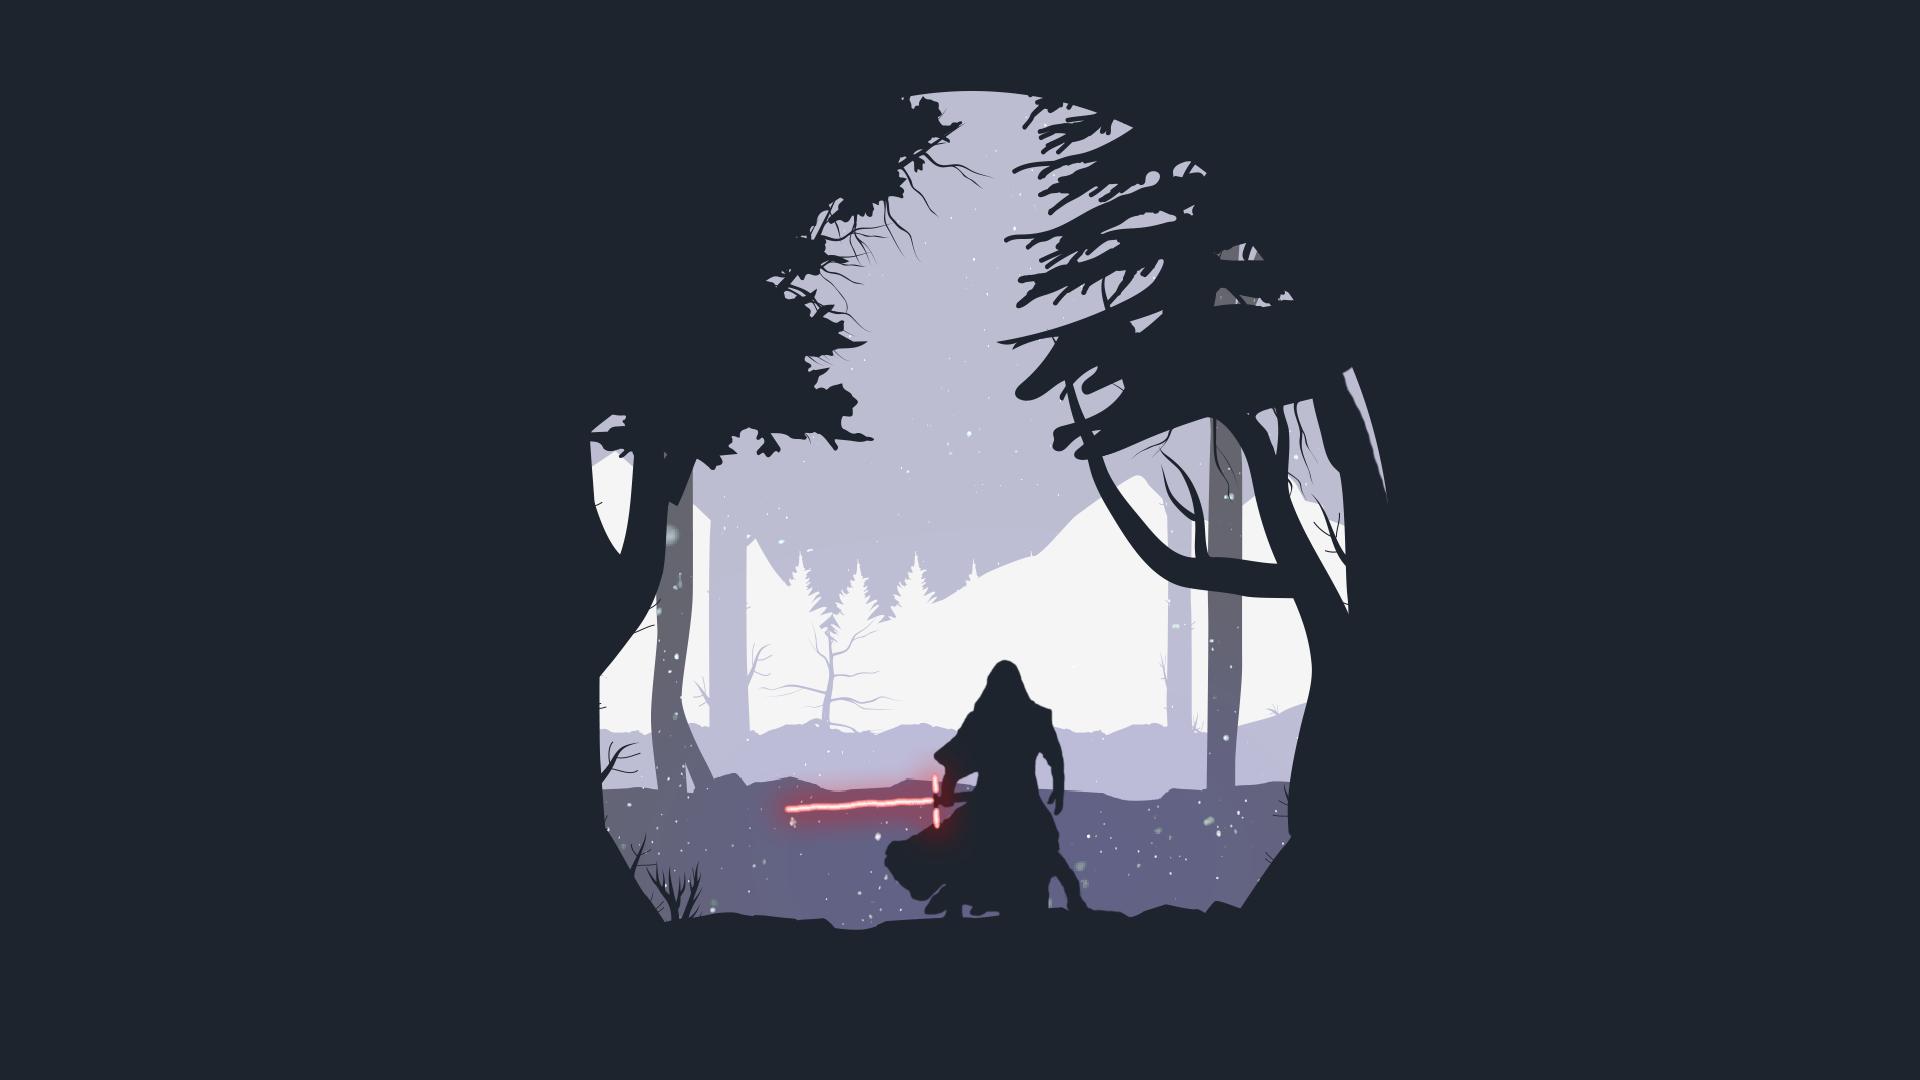 Star-Wars-Desktop-Wallpaper-The-Force-Unleashed-Kylo-Ren